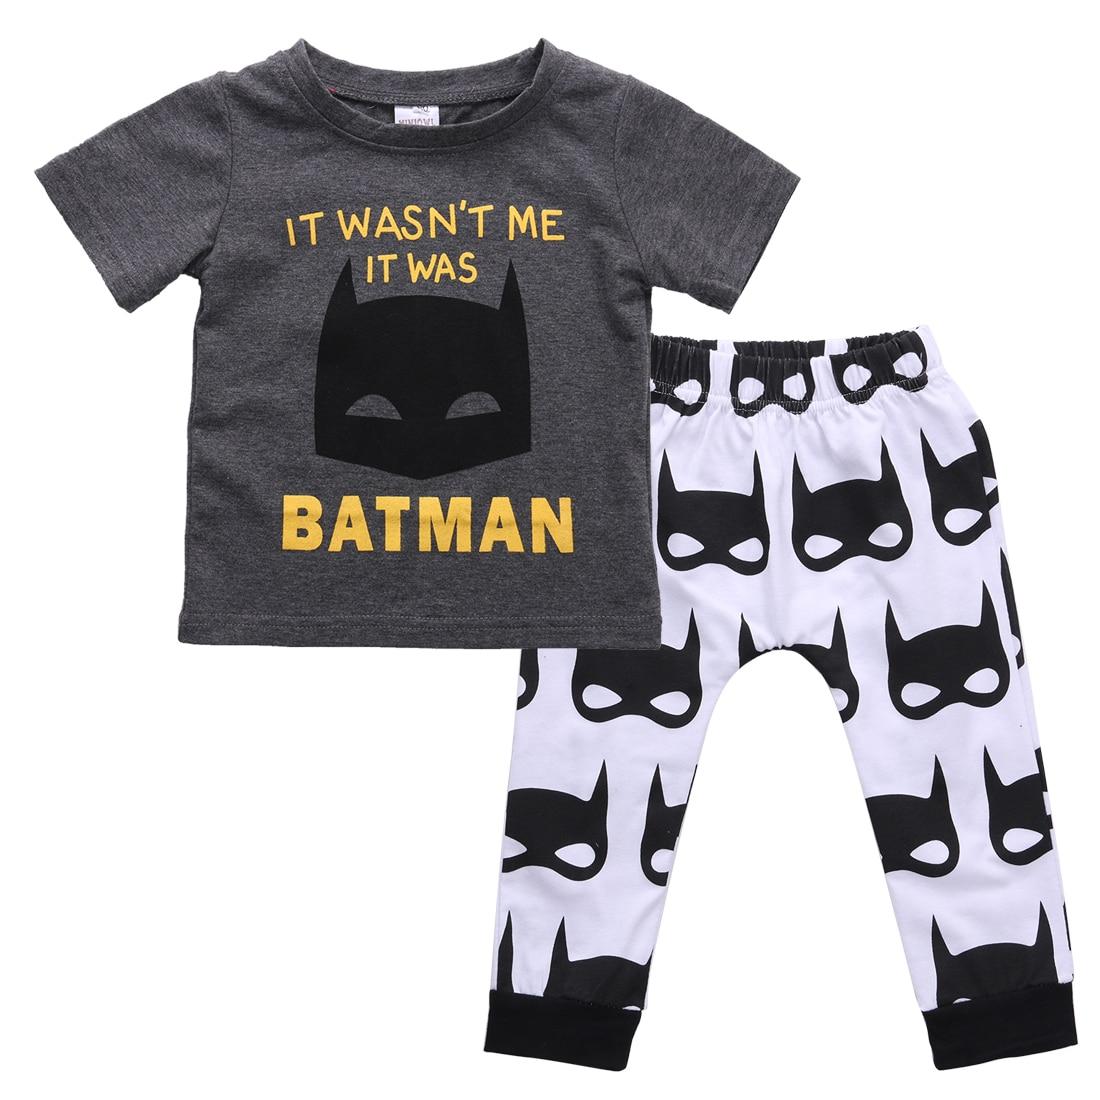 4e9d530c 2Pcs Set Newborn Baby Boys Batman 2016 Baby Boy Clothes Batman Cotton  Shorts + Pants For Newborn Clothing Sets